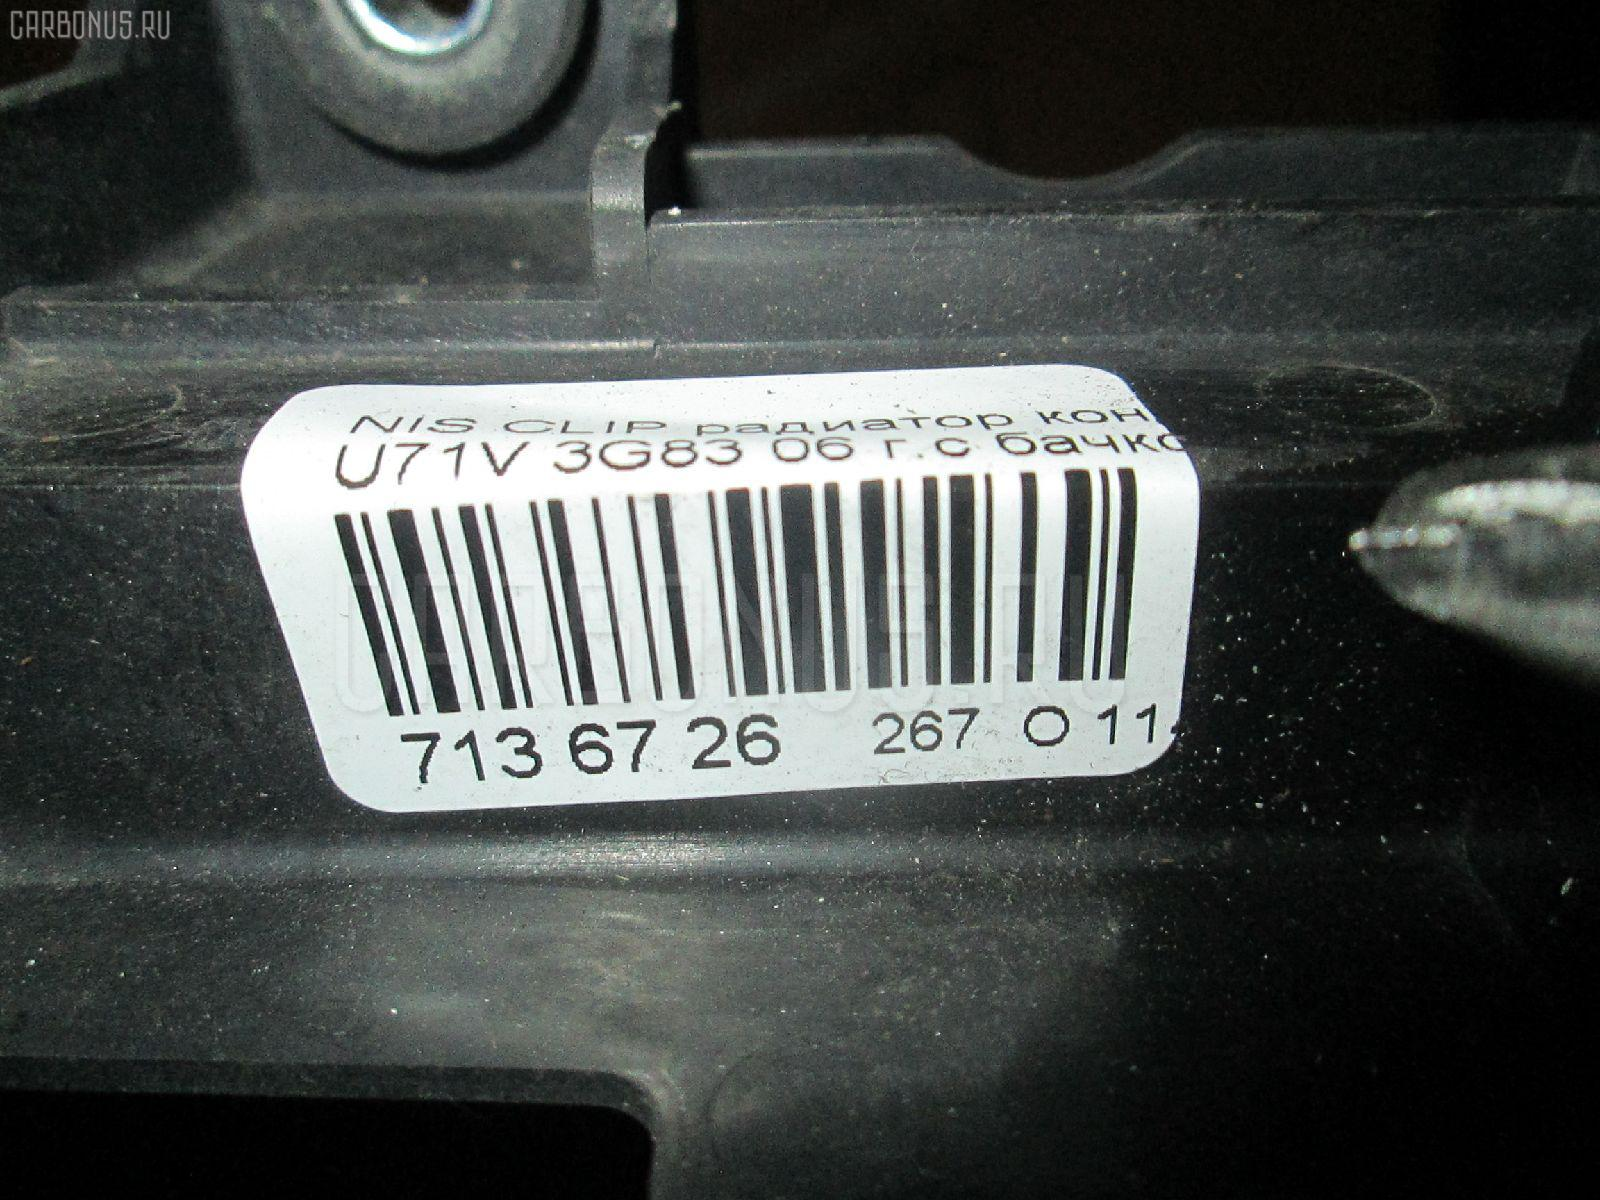 Радиатор кондиционера NISSAN CLIPPER U71V 3G83 Фото 3